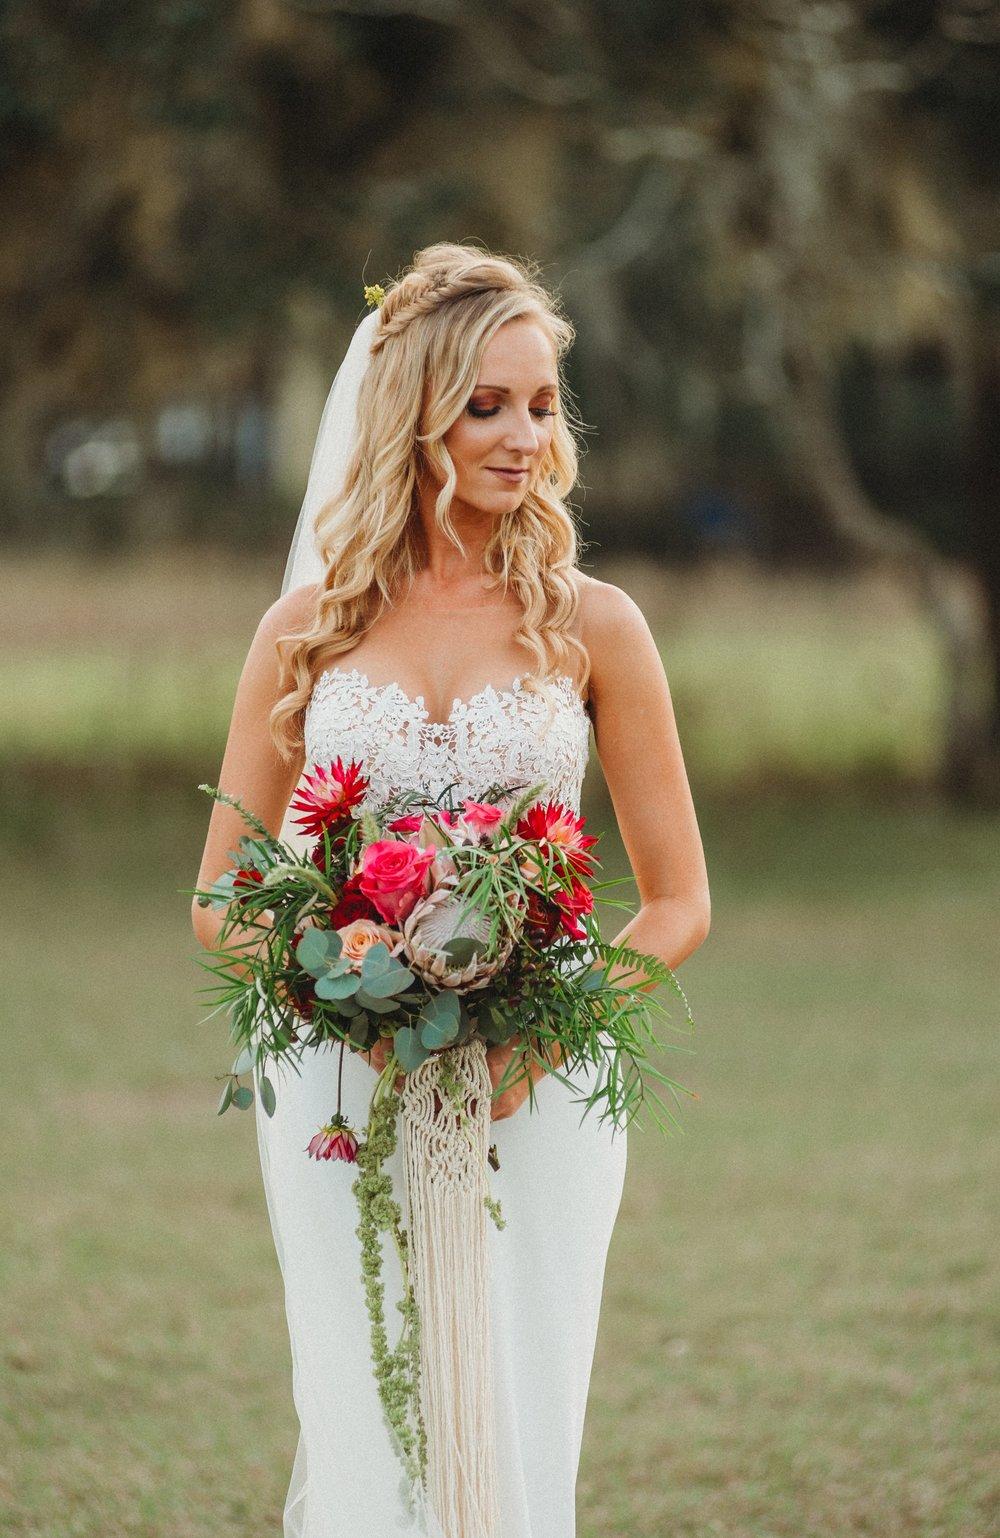 Dewitt-for-Love-Photography-Krysten-Jack-Orange-Blossom-Barn-Florida-Wedding-1.jpg